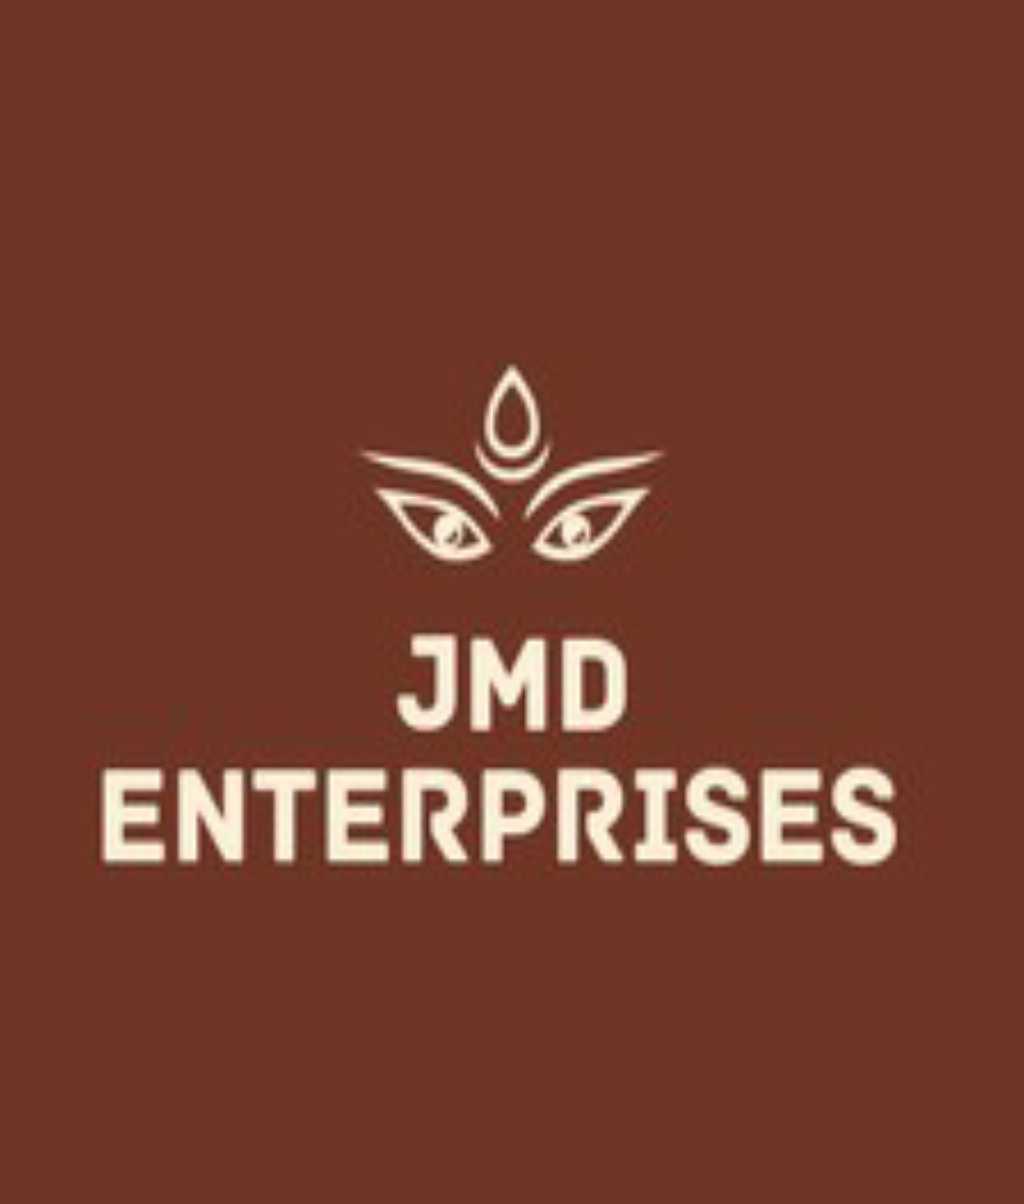 JMD ENTERPRISES